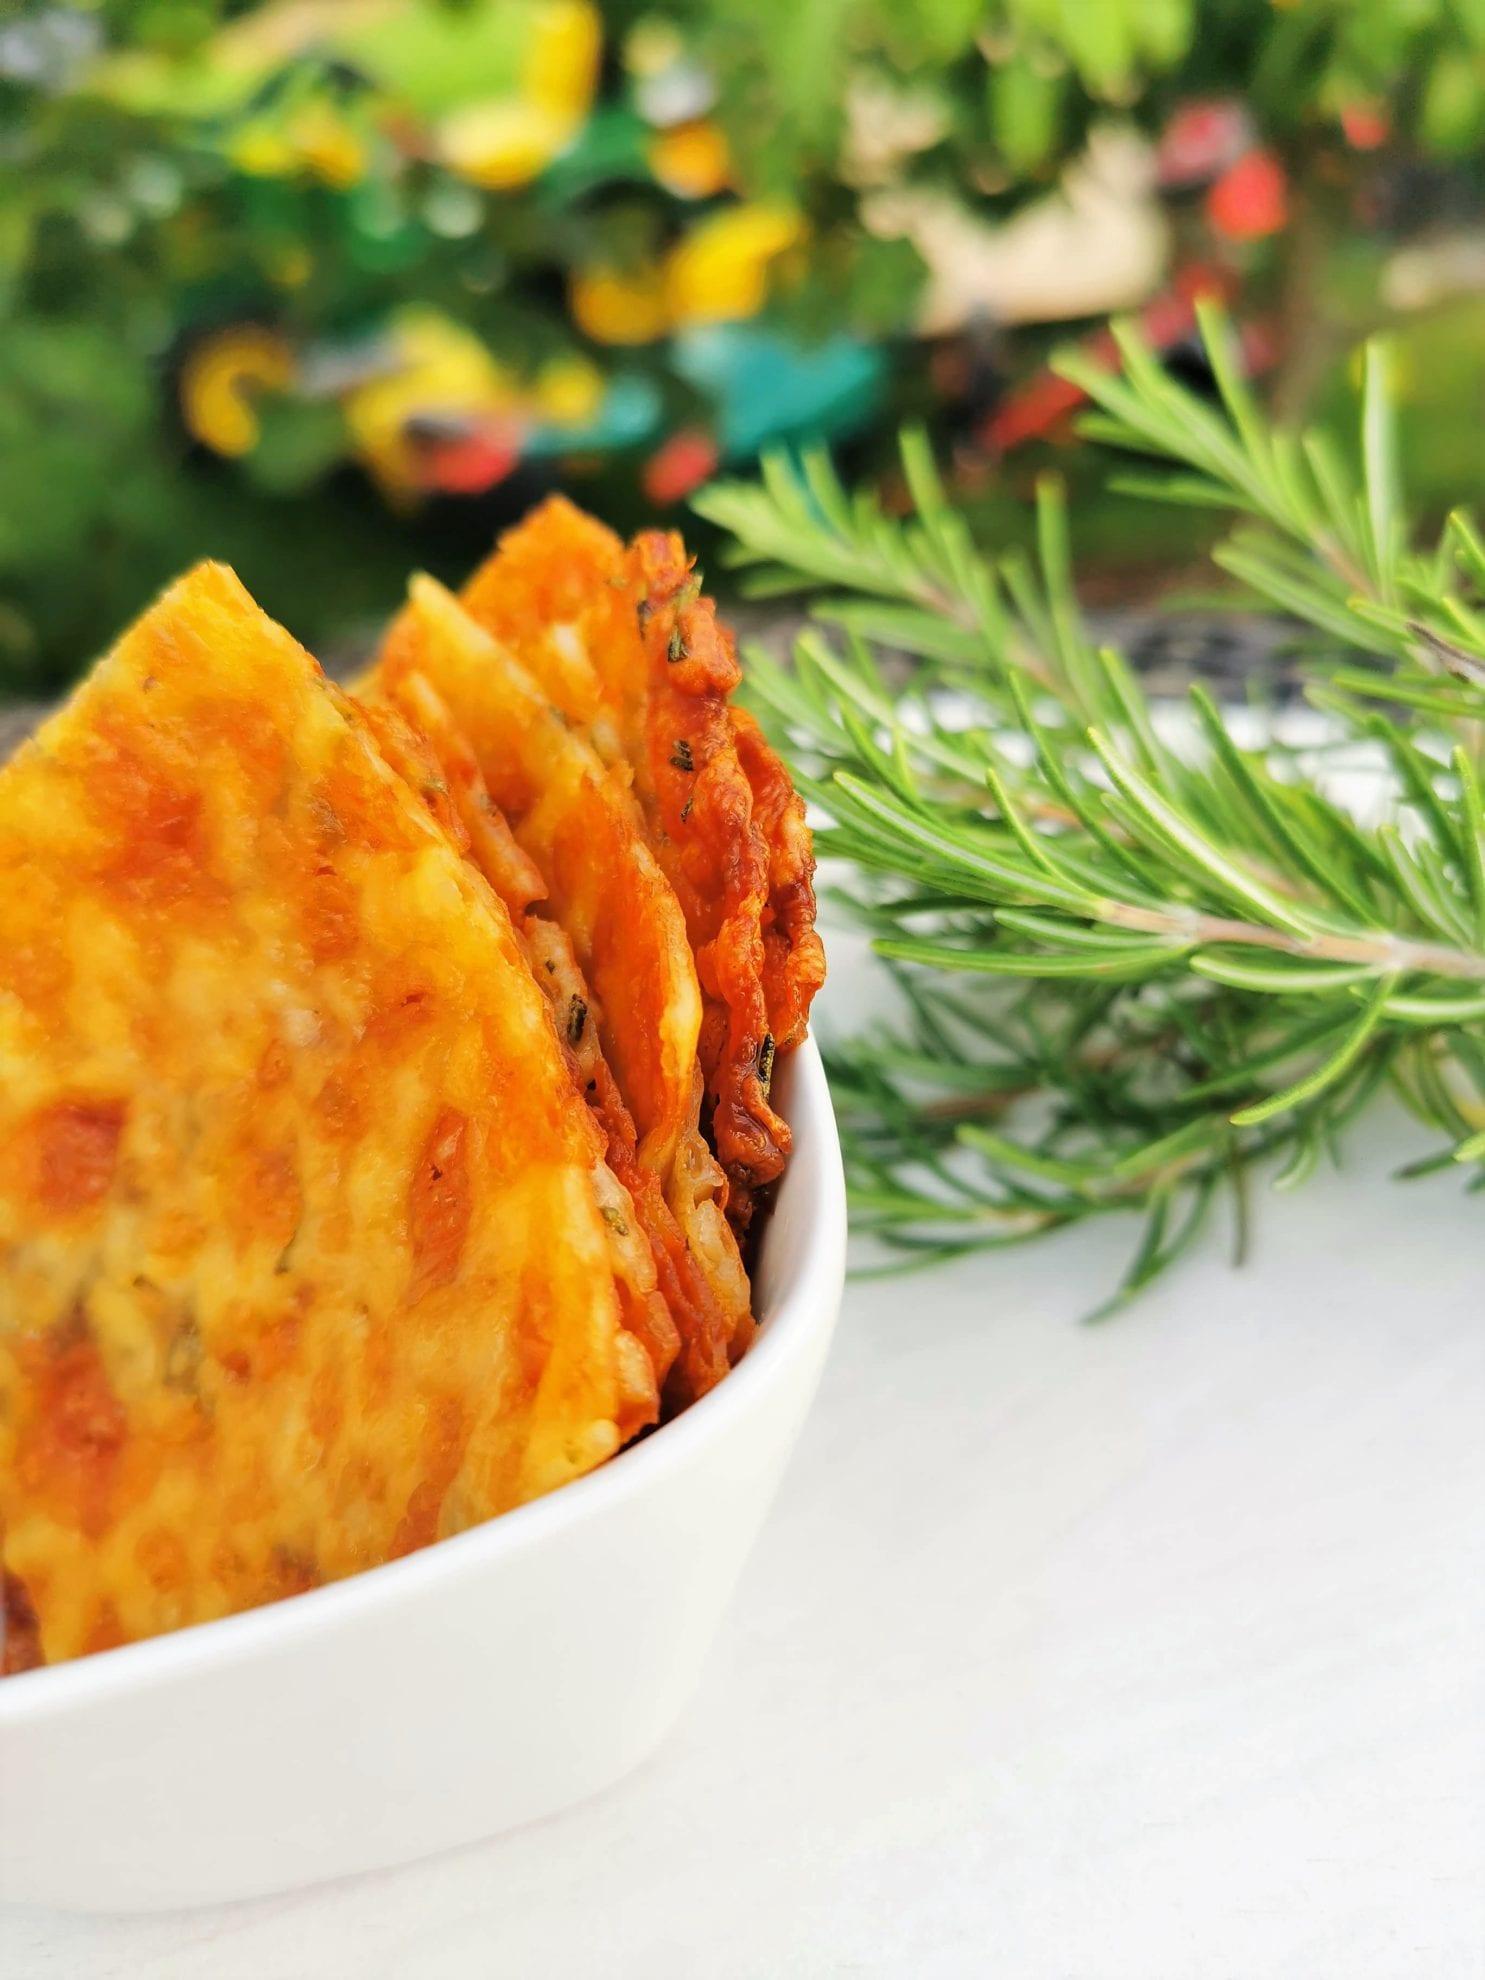 lecker Rezept fuer Kaesechips aus Mozzarella mit Rosmarin bei Puddingklecks Mamablog